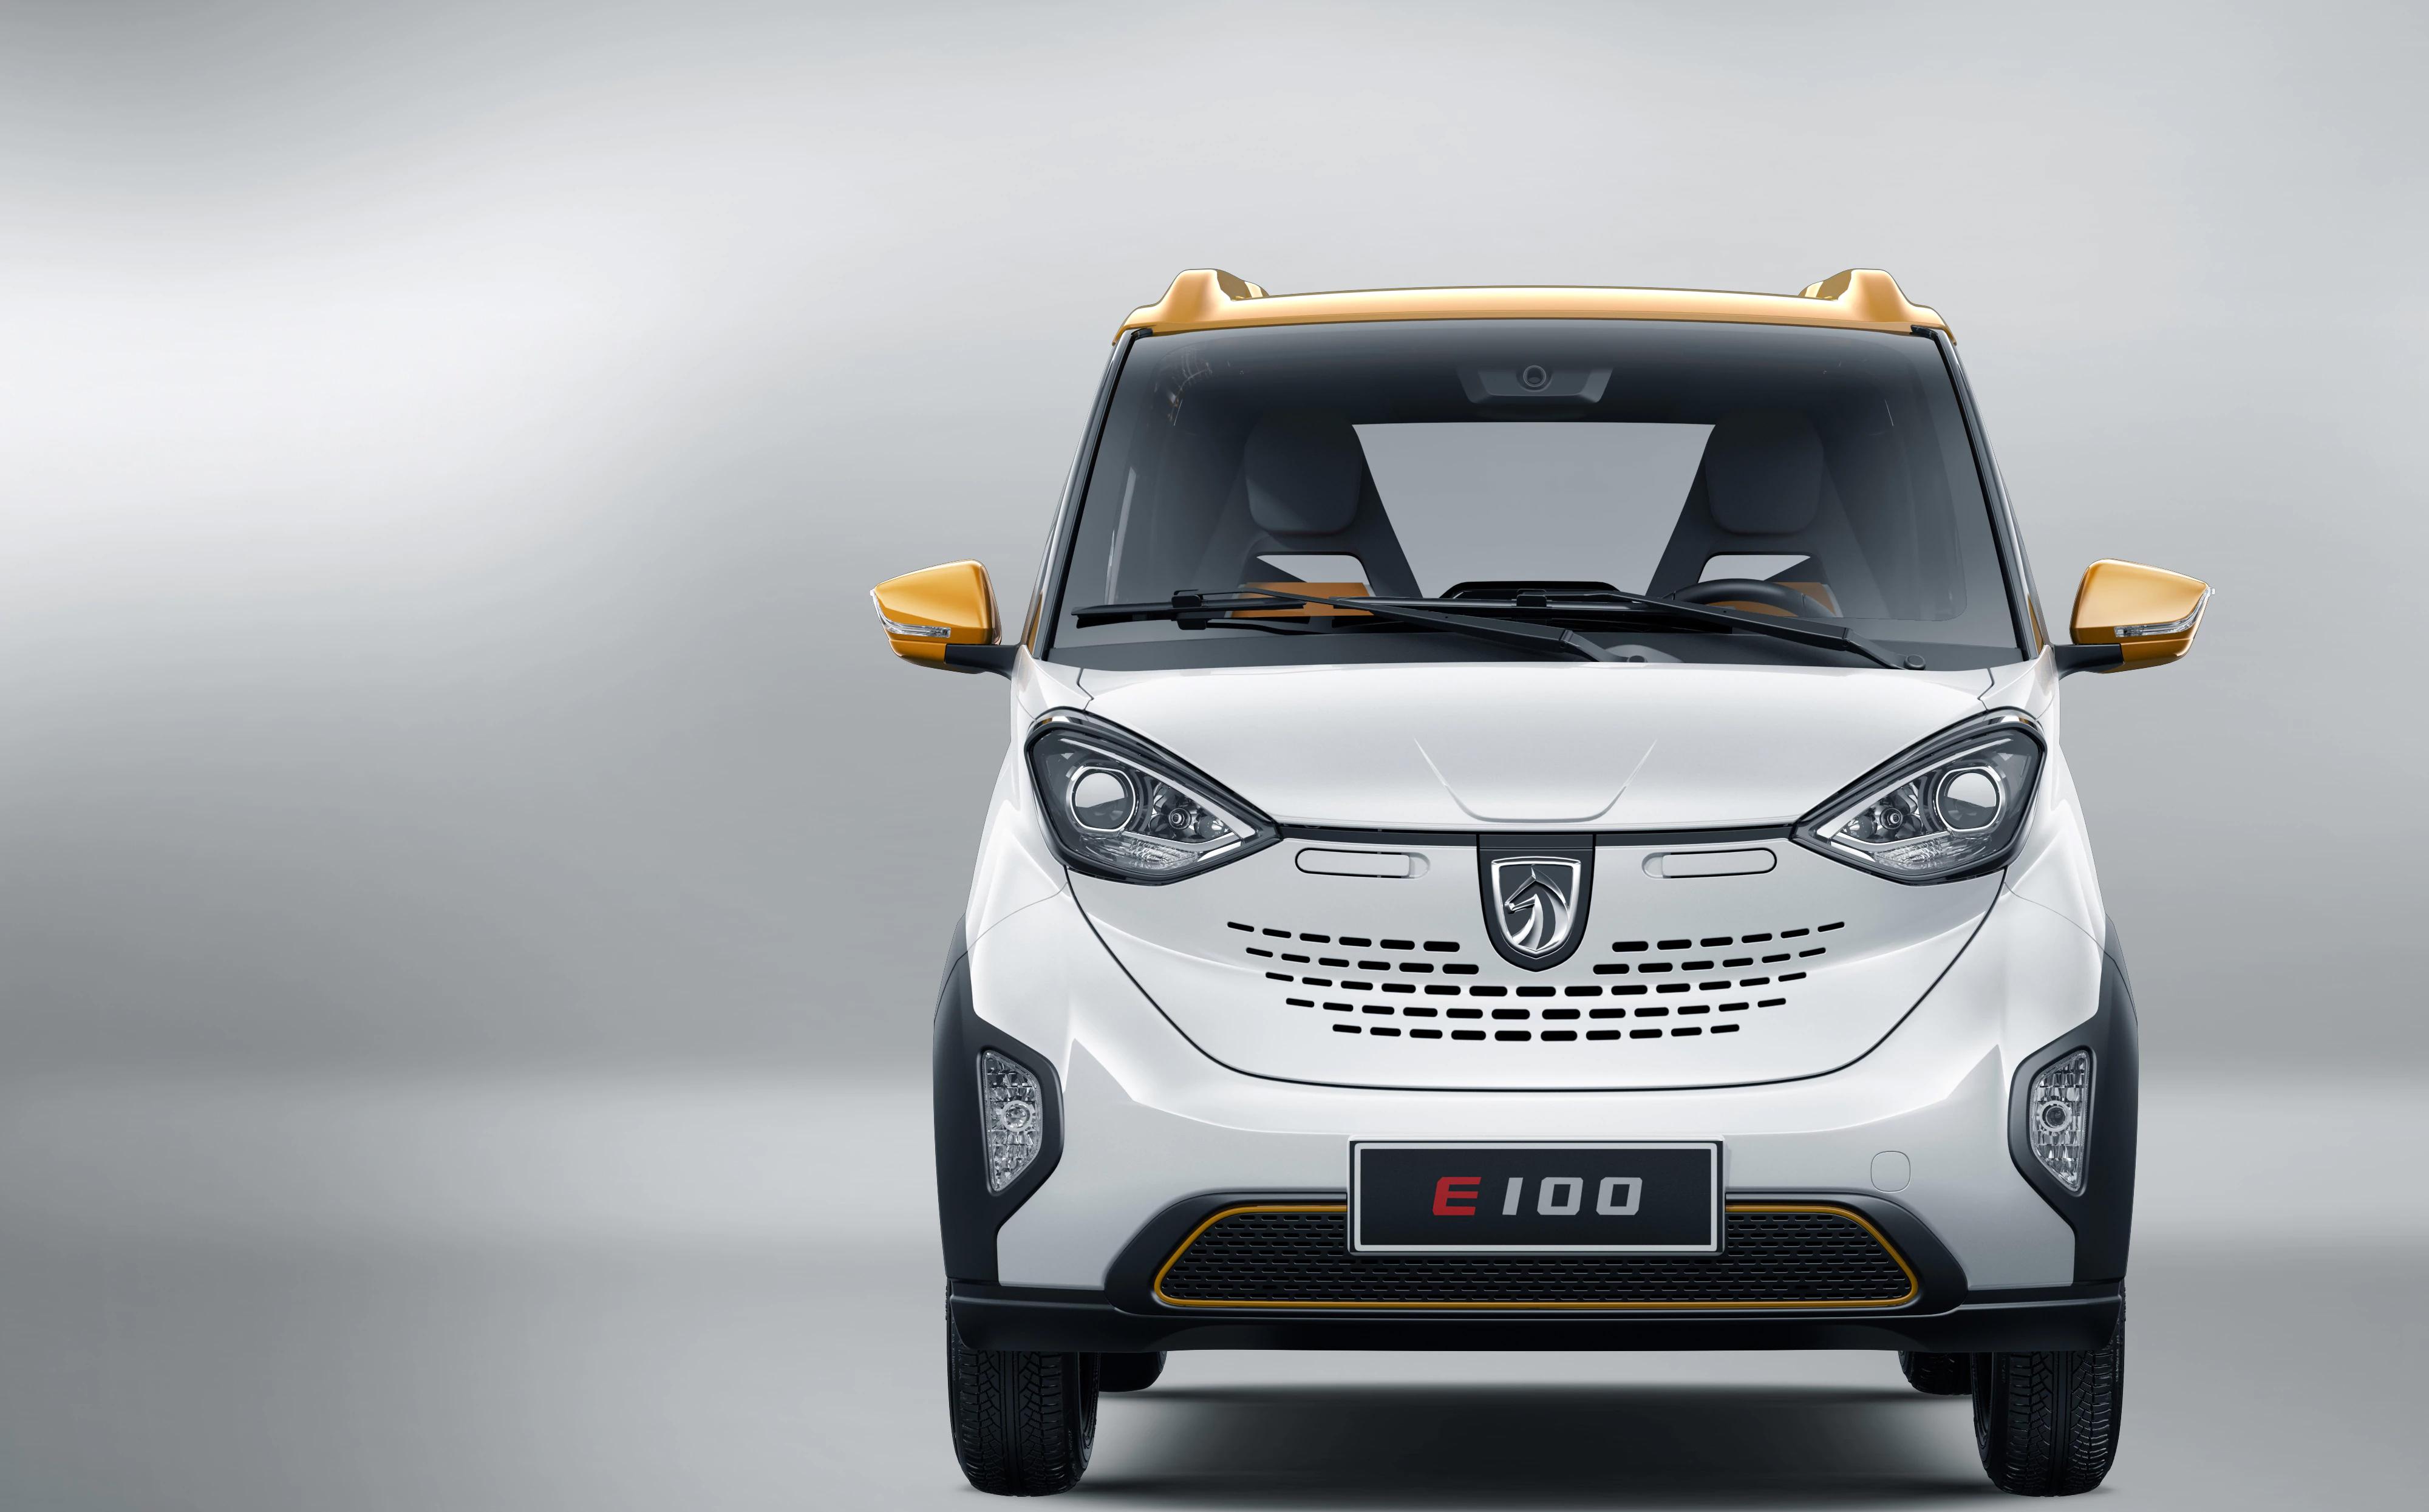 Scoop! Baojun E100 electric car spotted - Team-BHP